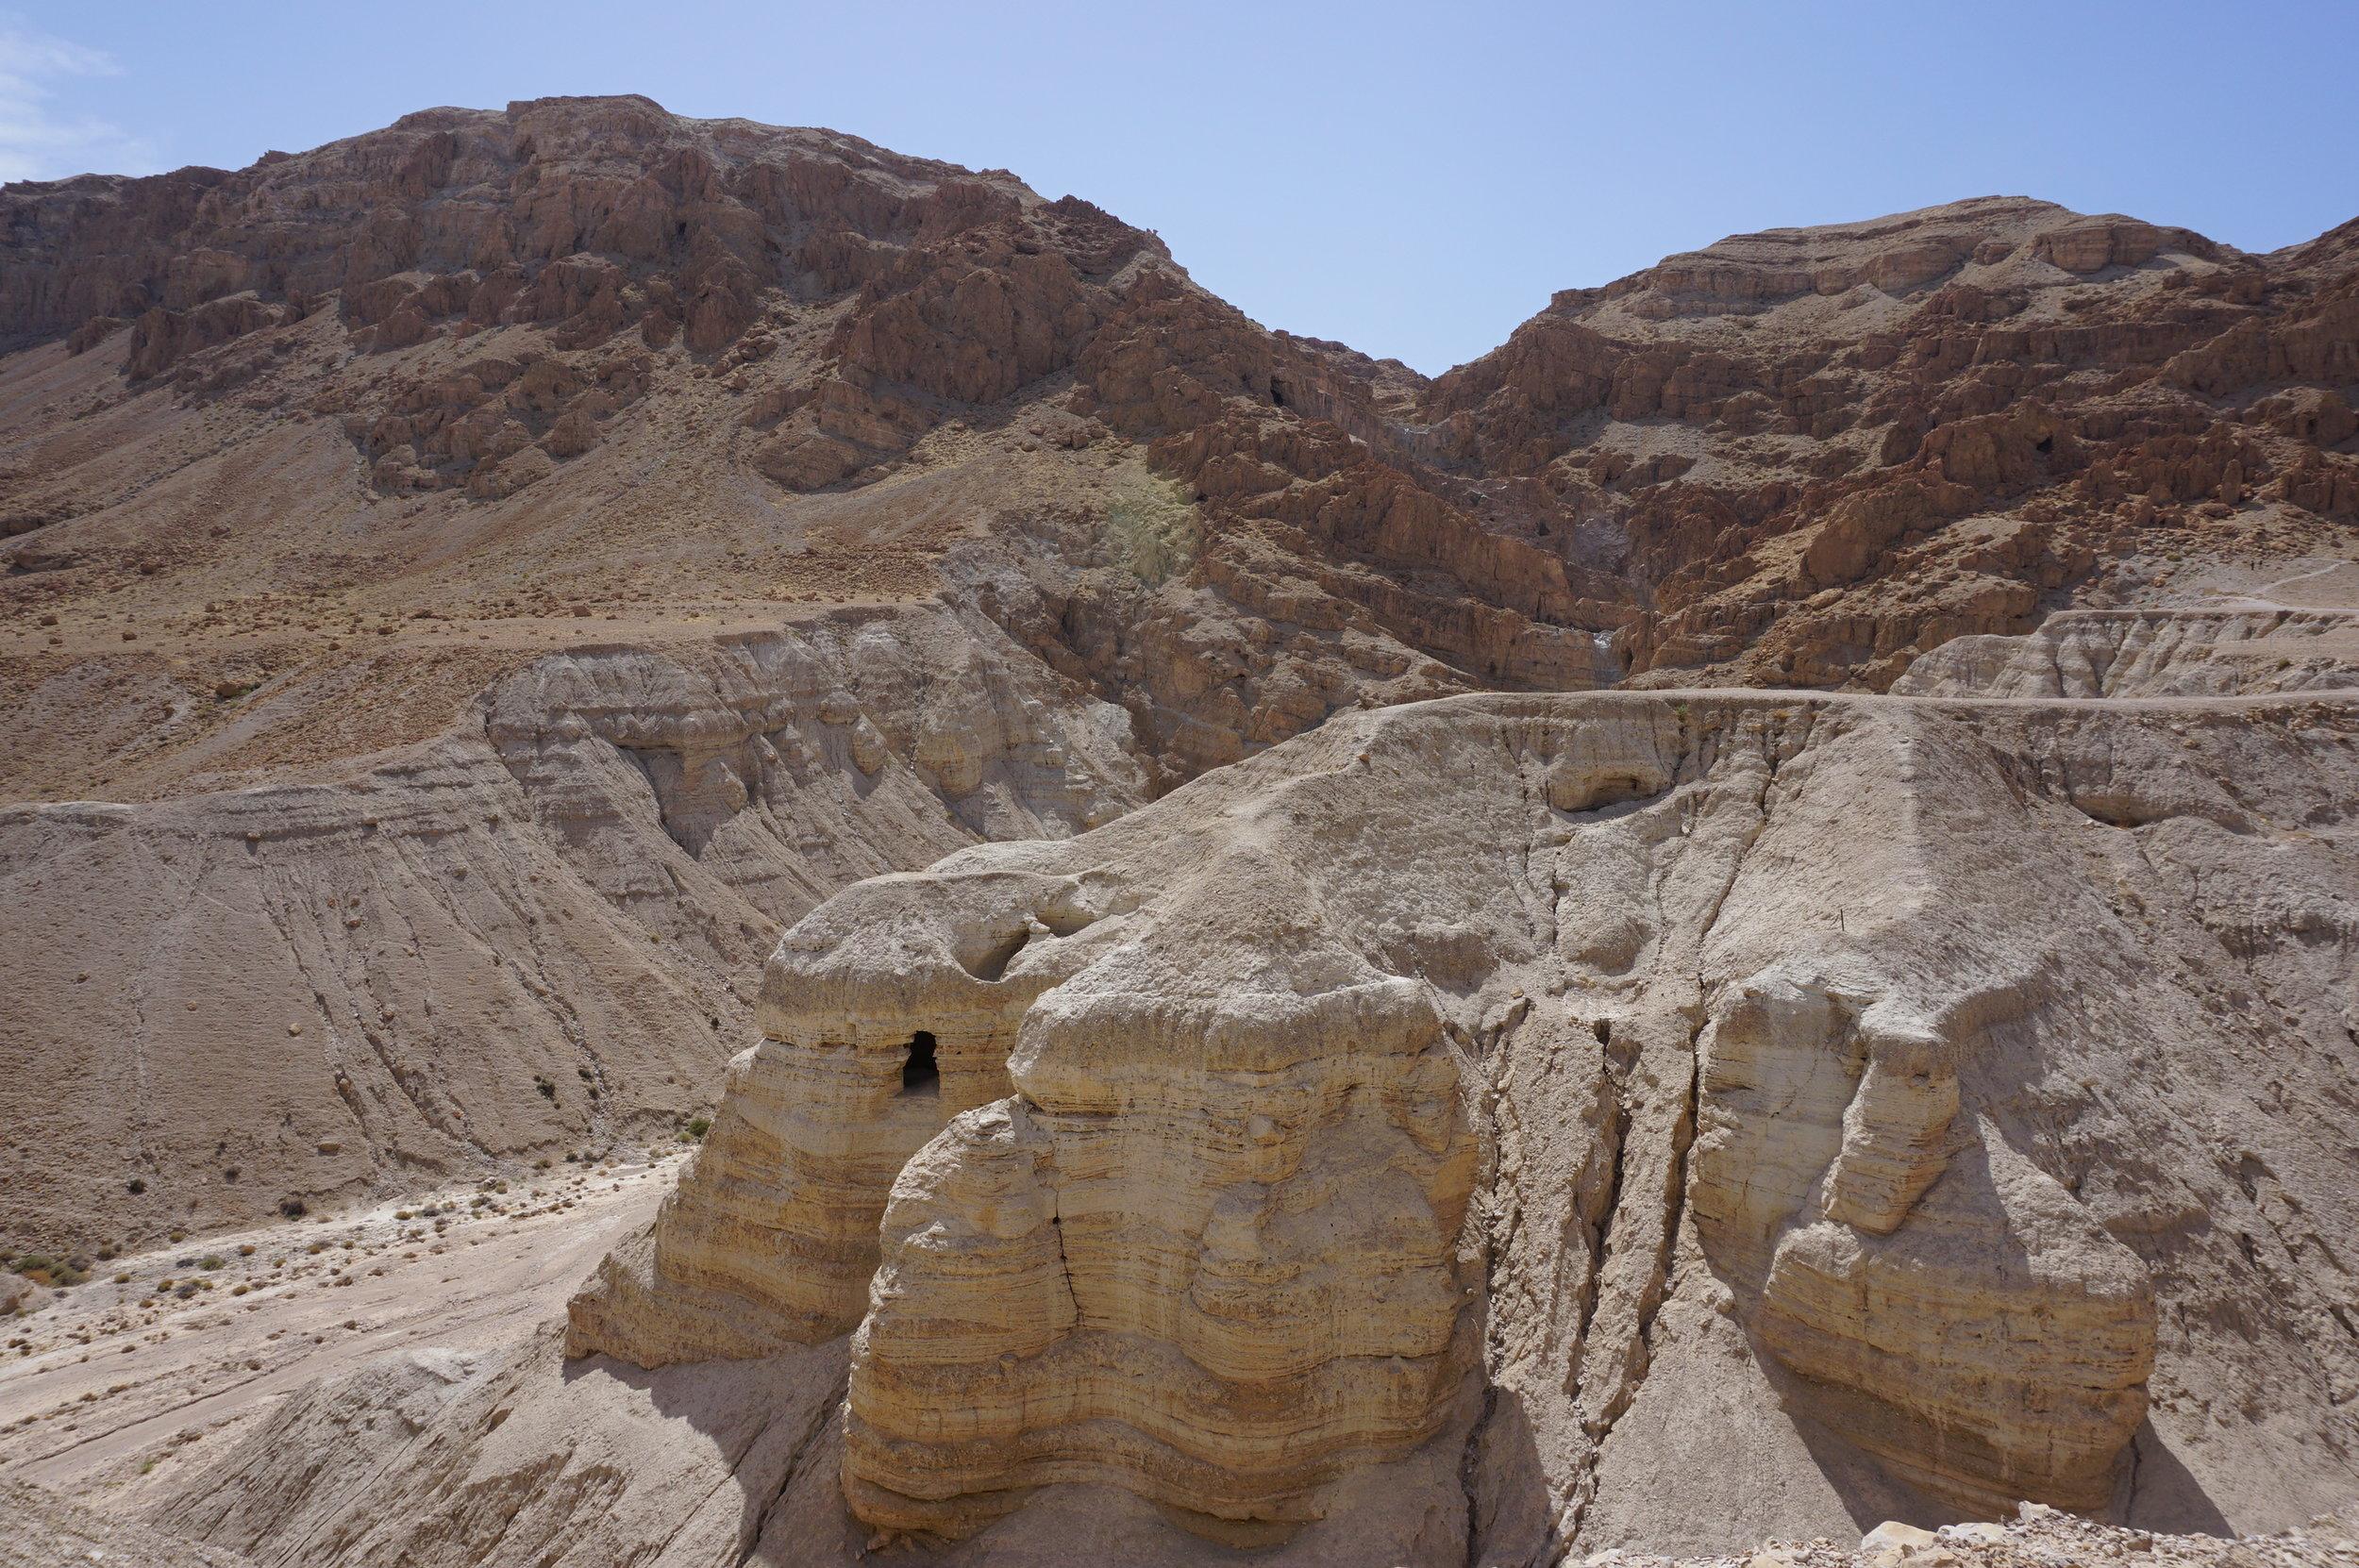 Qumran Israel Dead Sea Scrolls 2.JPG